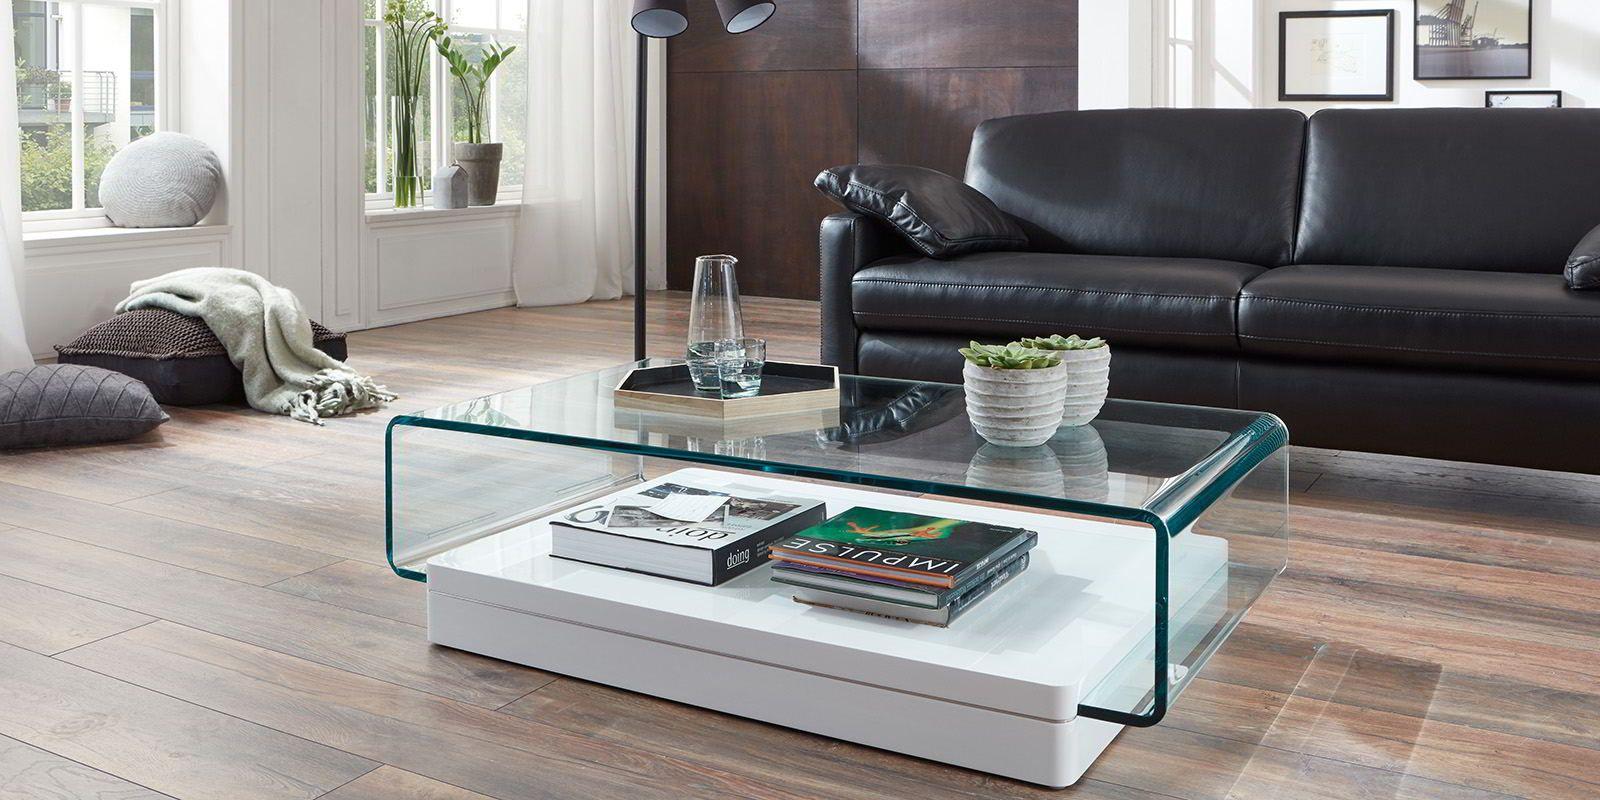 Designer Couchtisch Jura Glastisch Klarglas - Comfort16Home